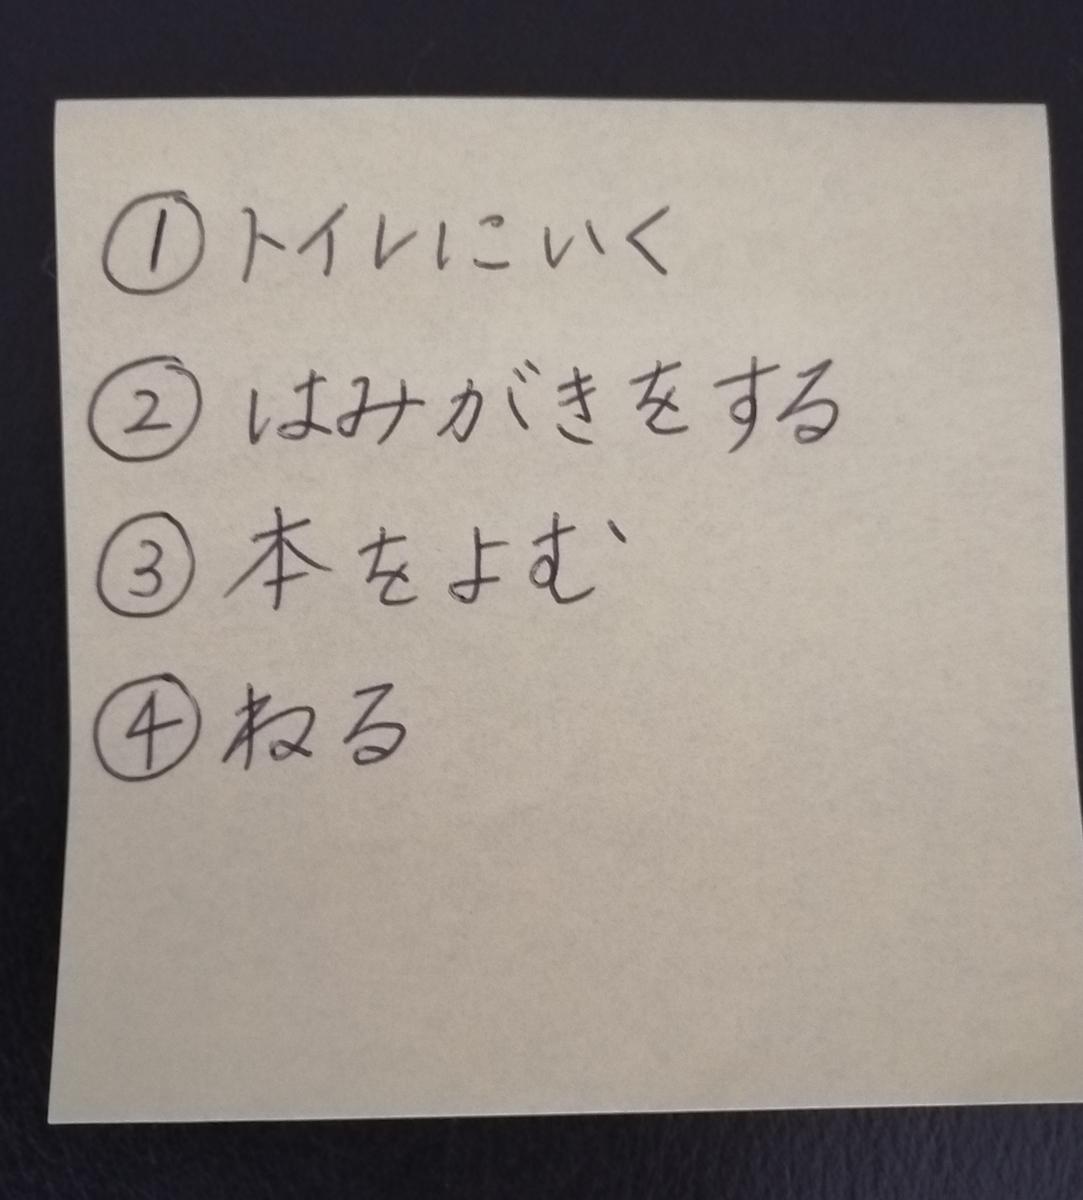 f:id:jiheishoumama:20200704202837j:plain